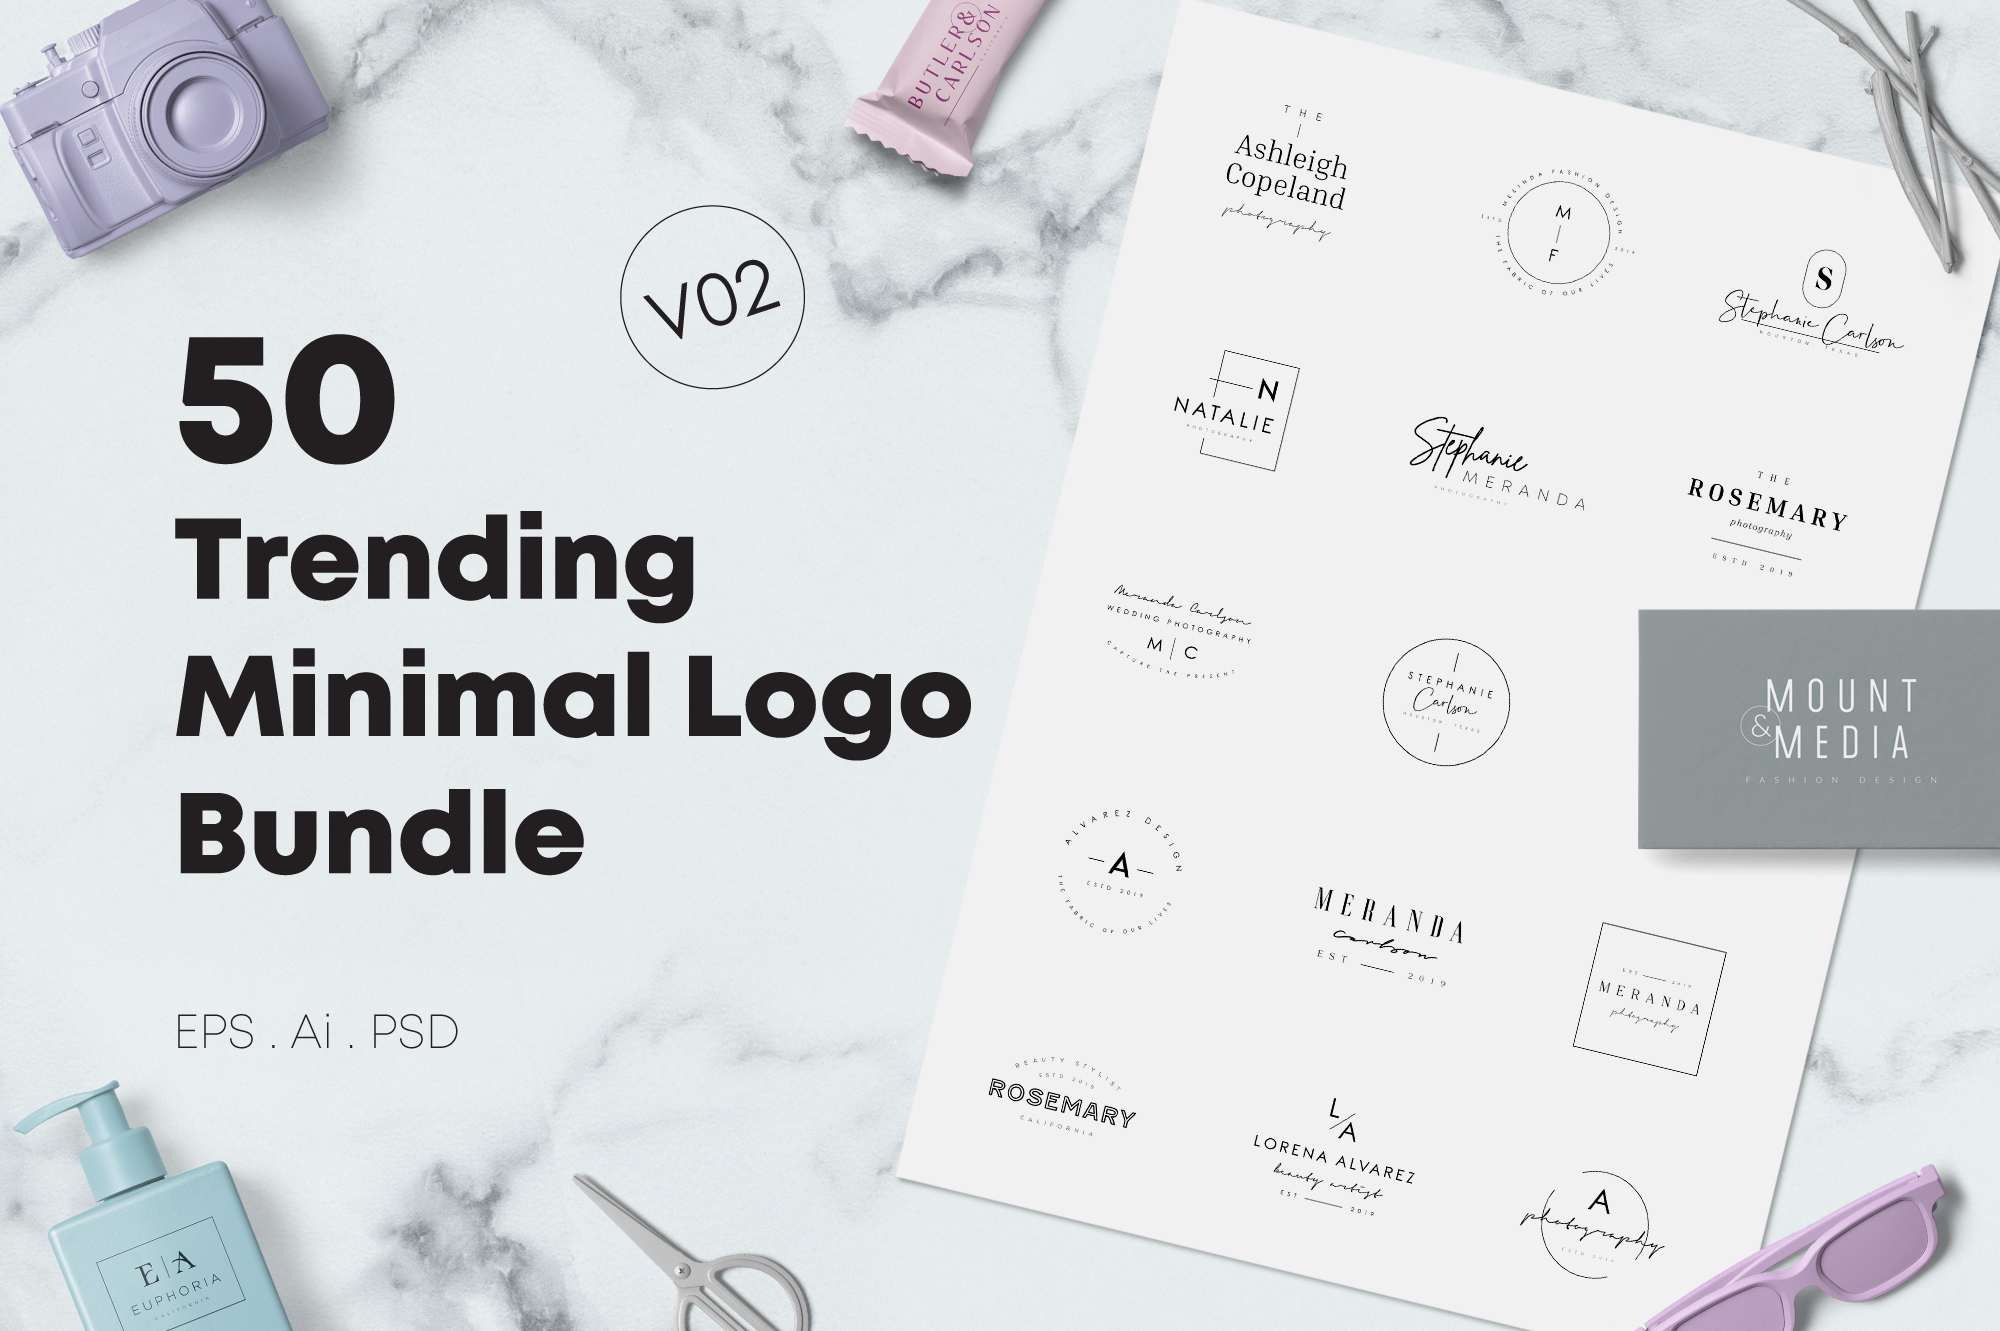 200 Trending Minimal Logo Bundle example image 12